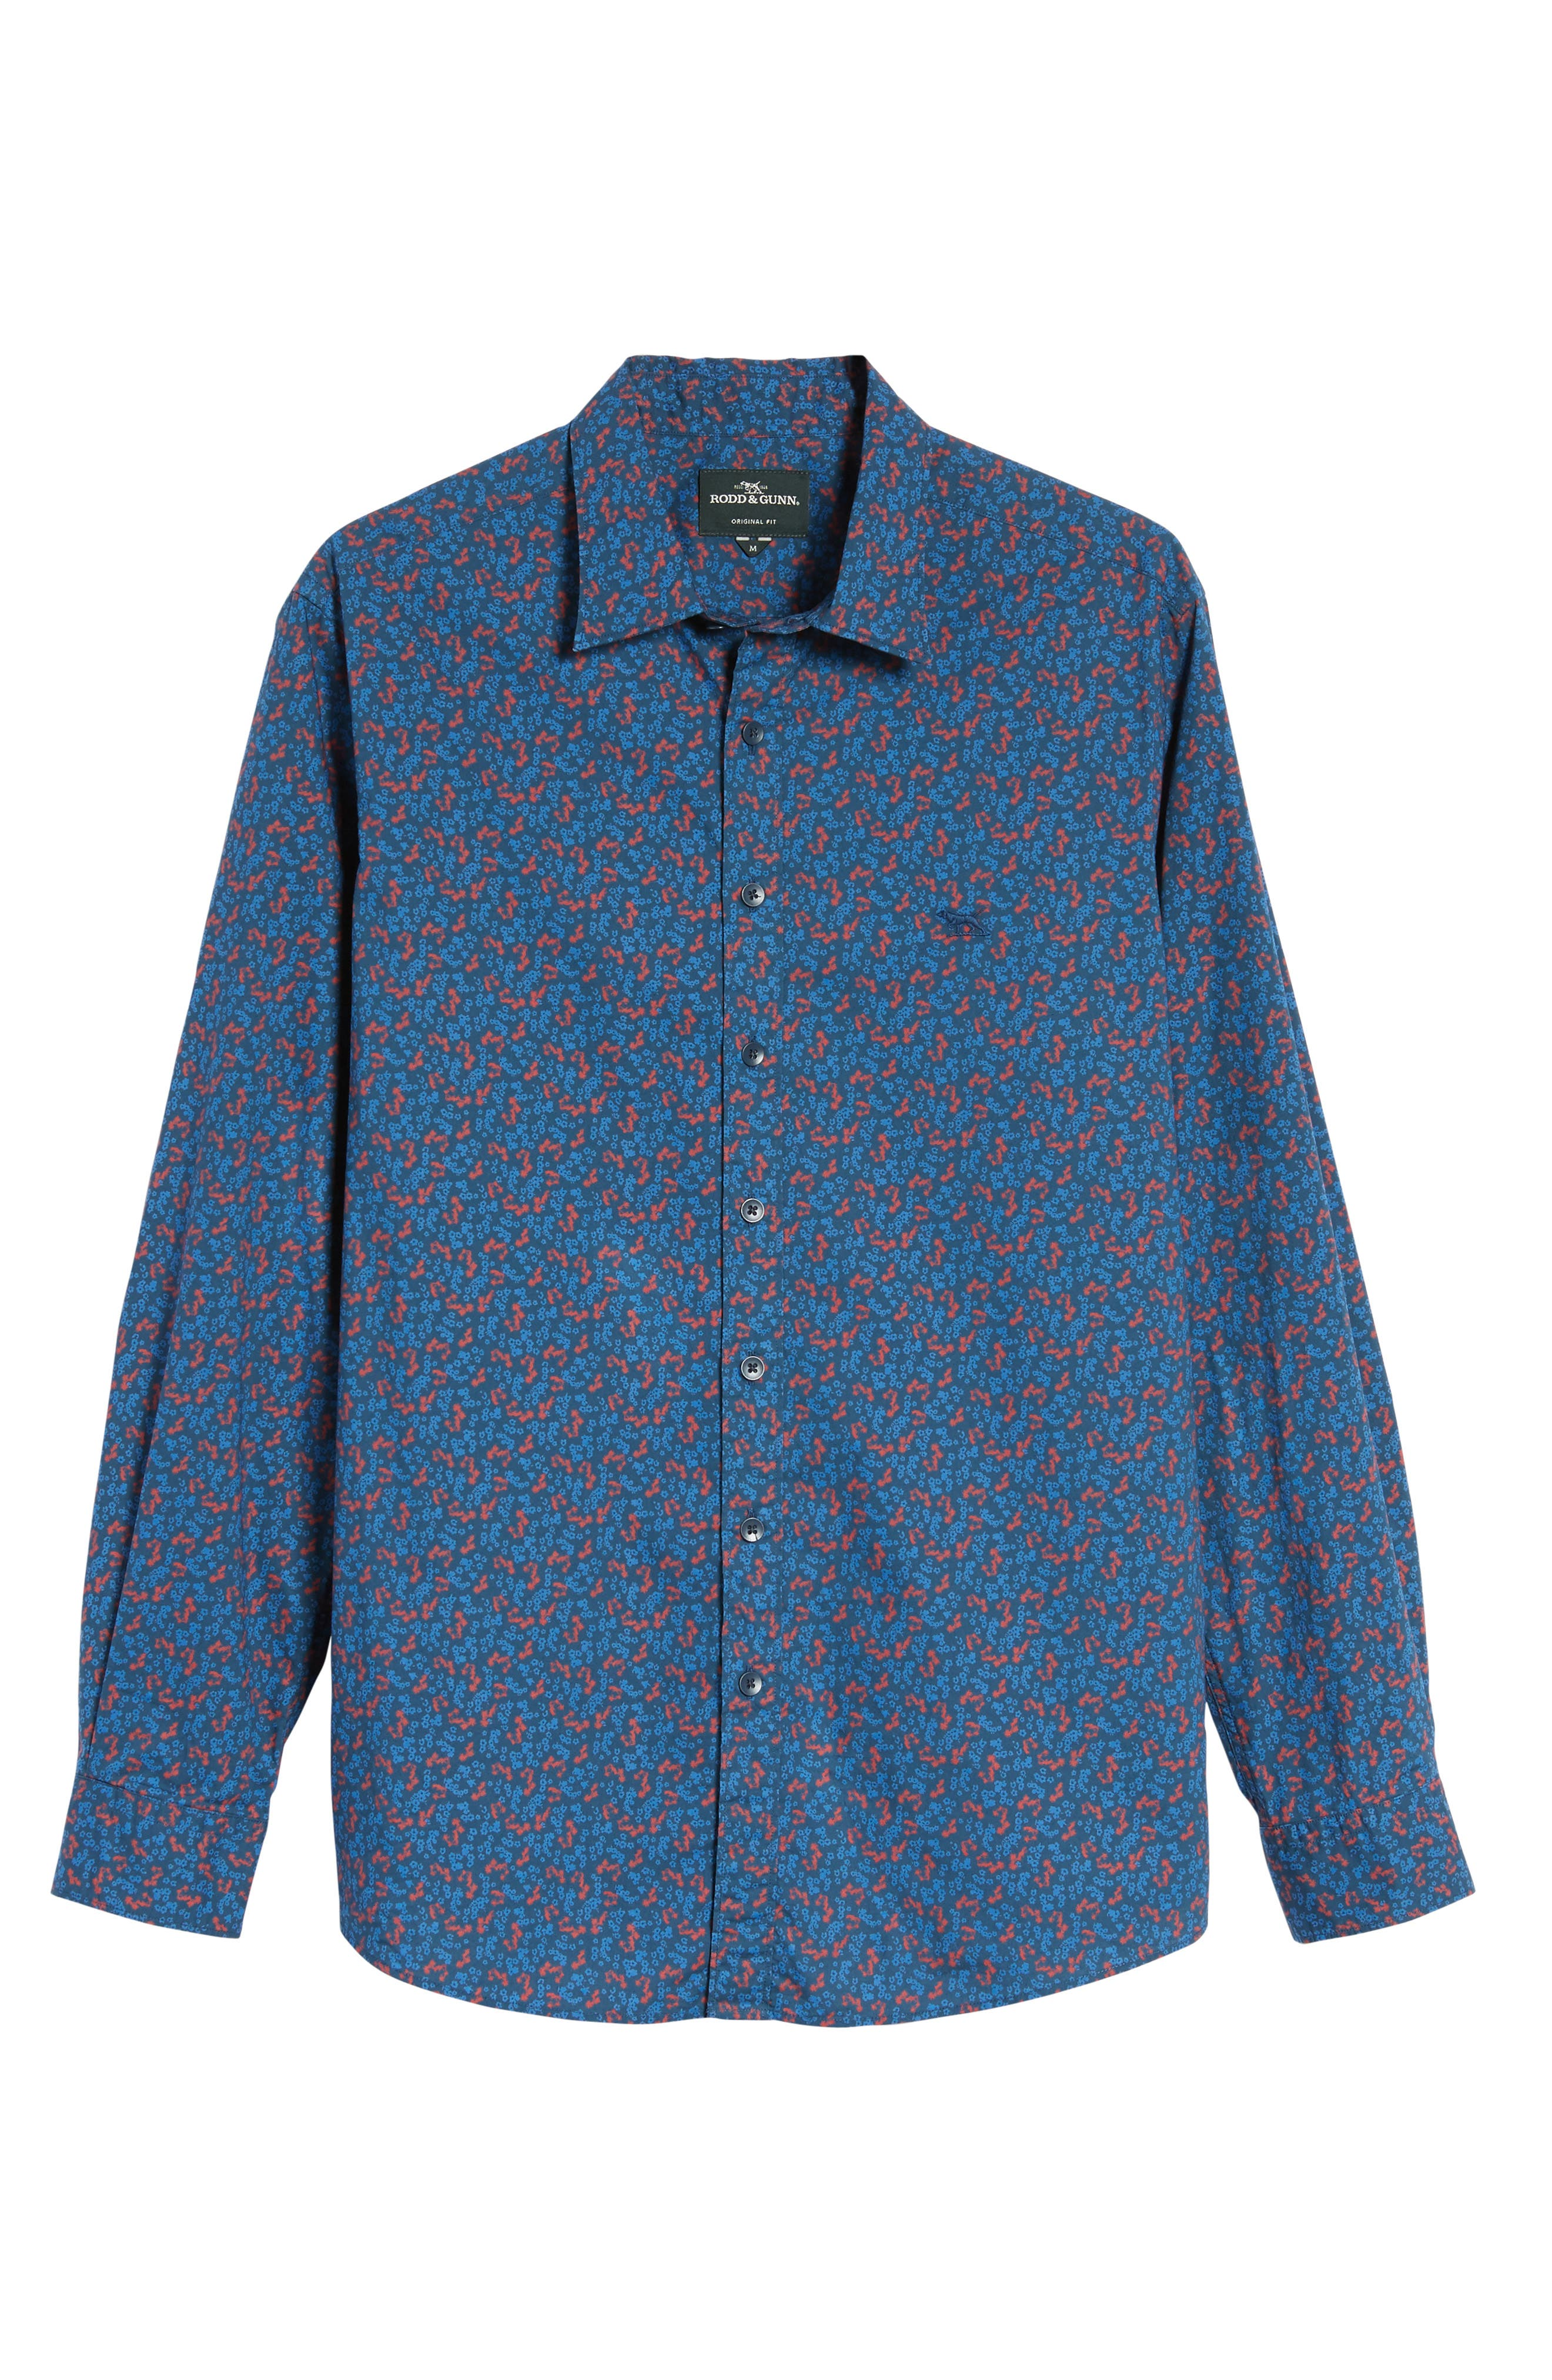 Patons Rock Original Fit Print Sport Shirt,                             Alternate thumbnail 6, color,                             412